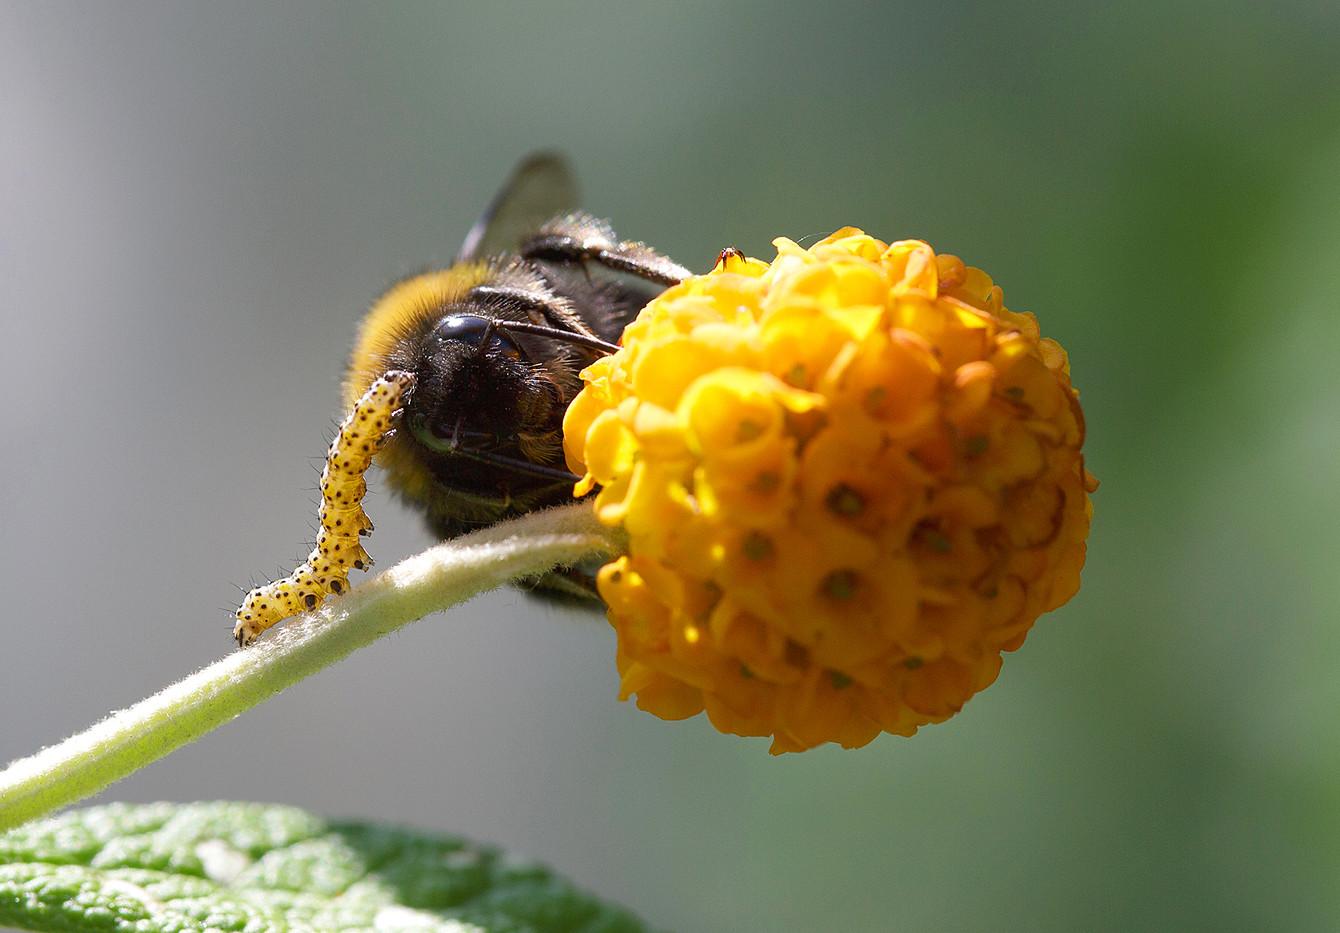 Mullein Moth Caterpillar and a Bee